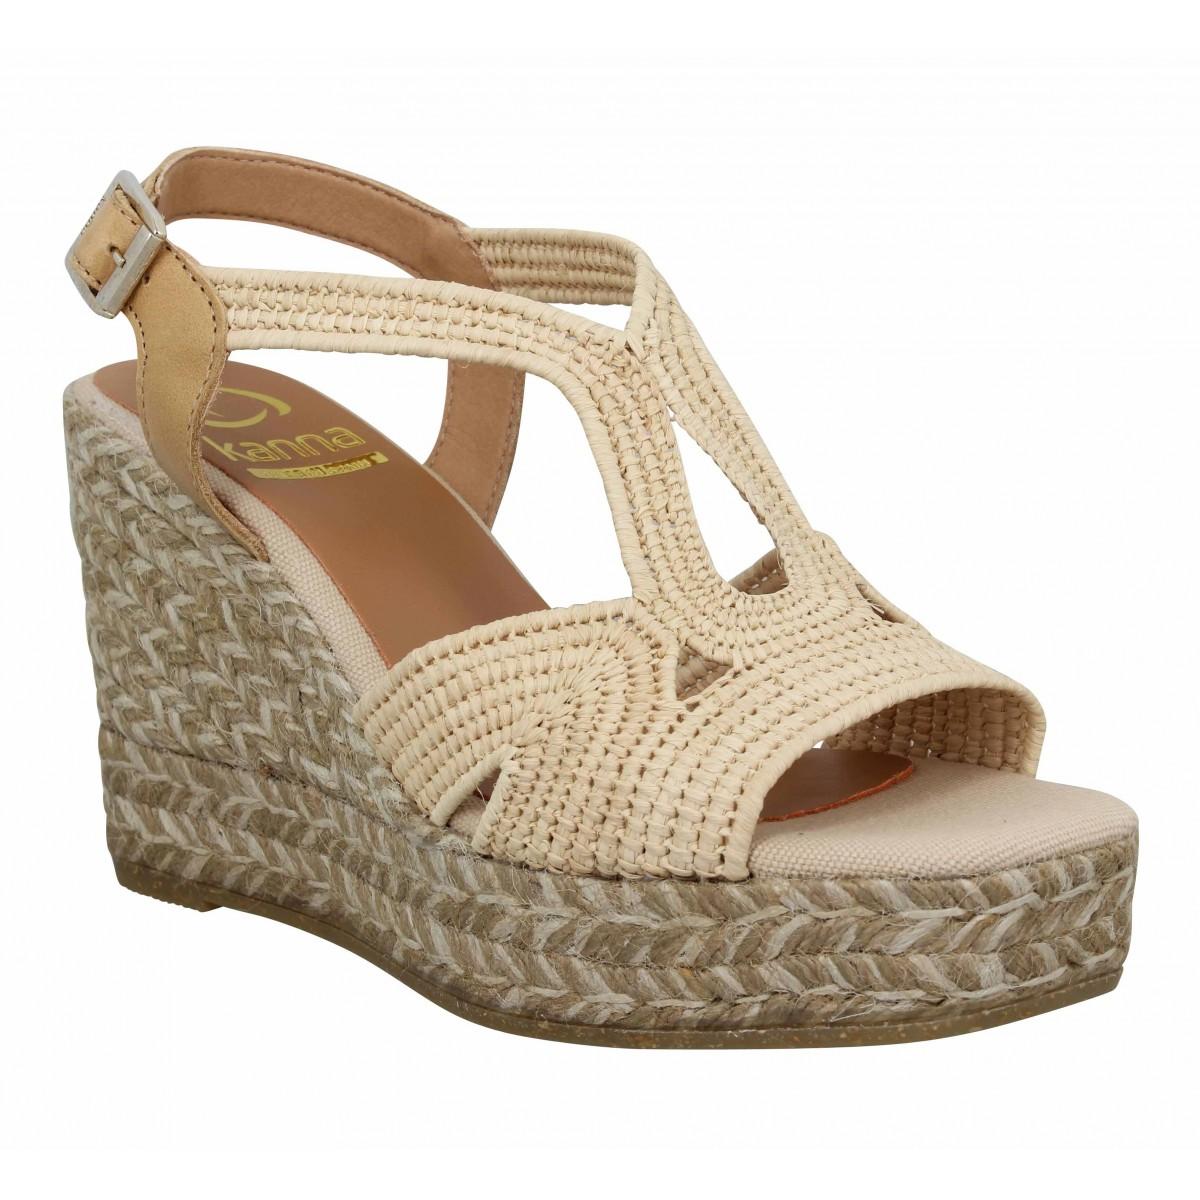 Sandales talons KANNA 21051 rafia Femme Naturel